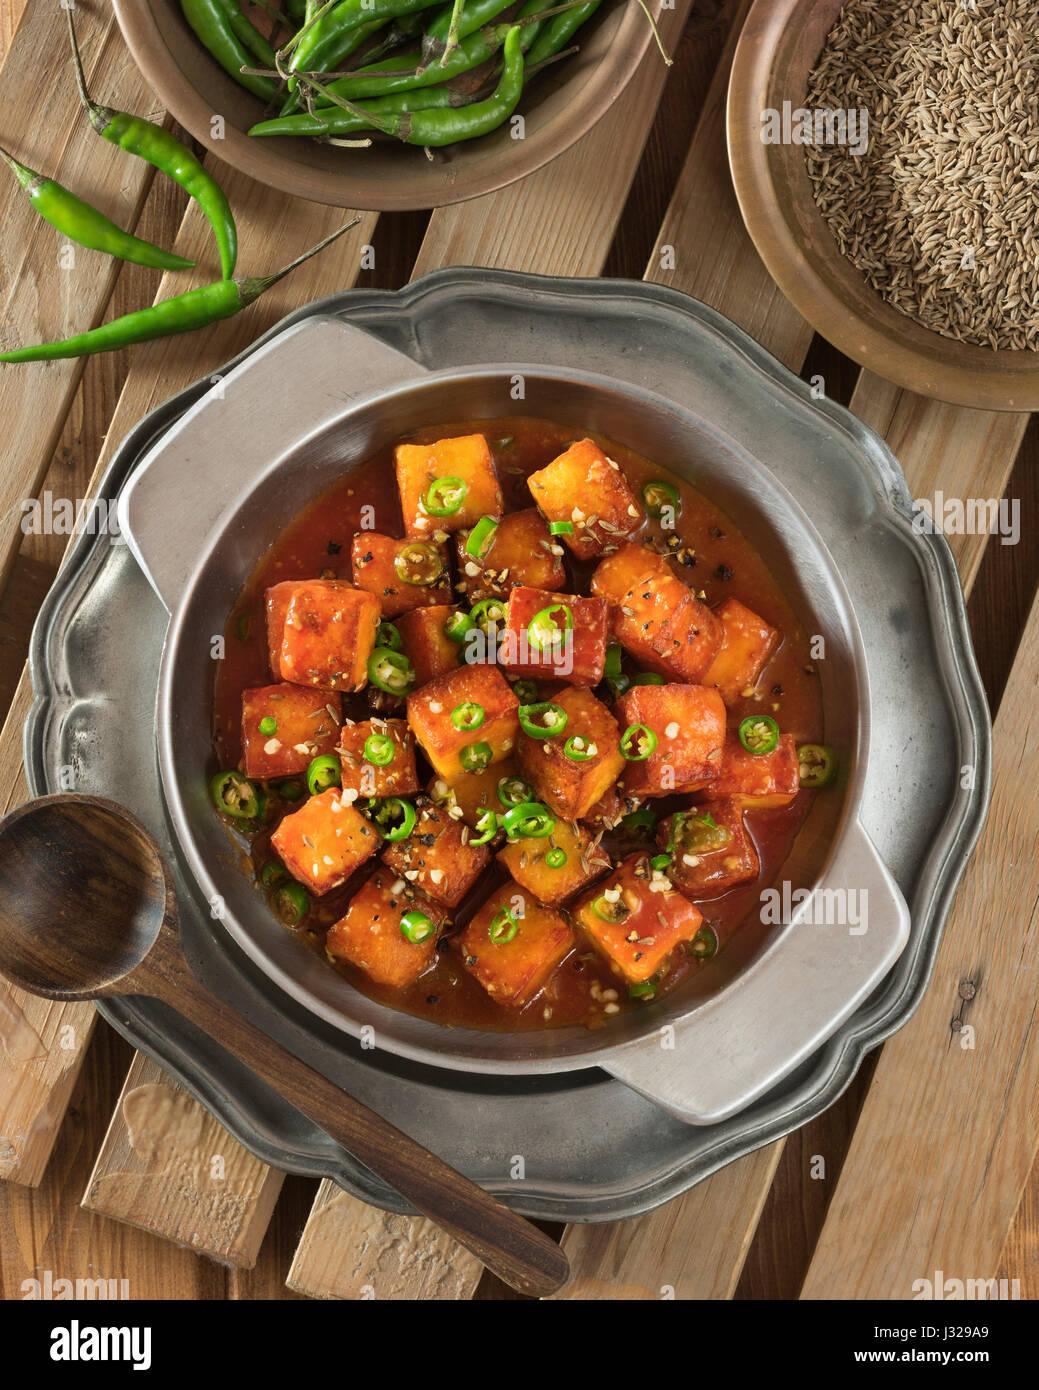 Chilli paneer spicy indo chinese starter india food stock photo chilli paneer spicy indo chinese starter india food forumfinder Image collections